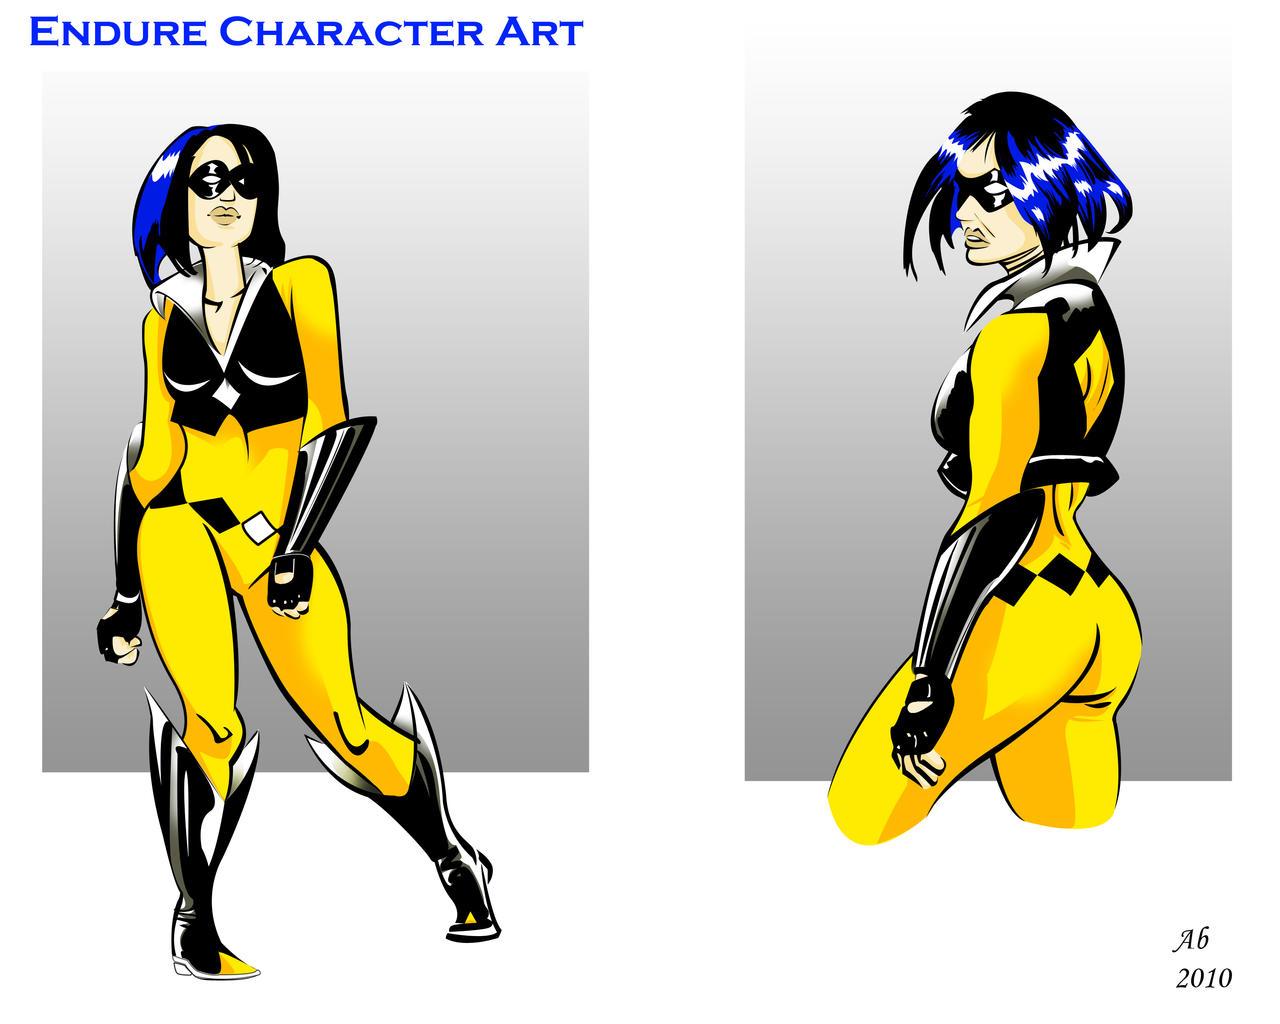 Endure_character art01 by AlexBaxtheDarkSide